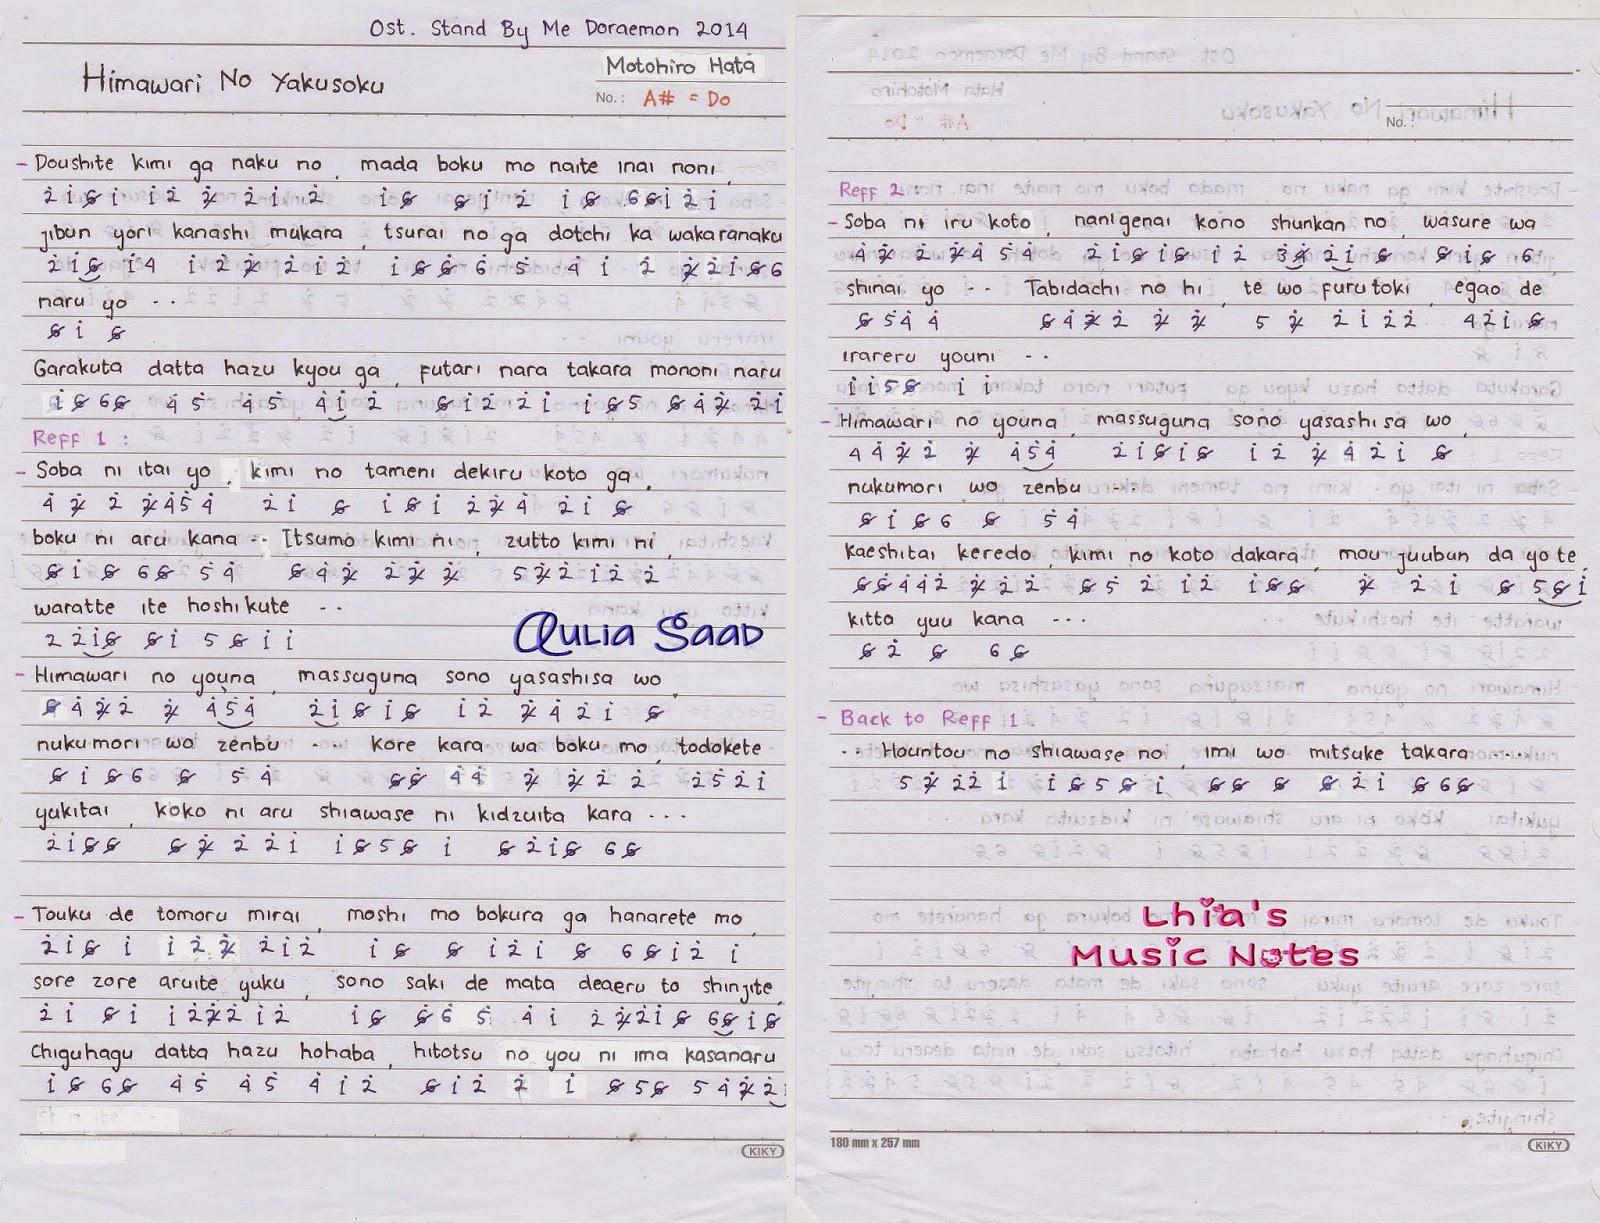 Lirik Lagu Chord Related Keywords - Lirik Lagu Chord Long ...